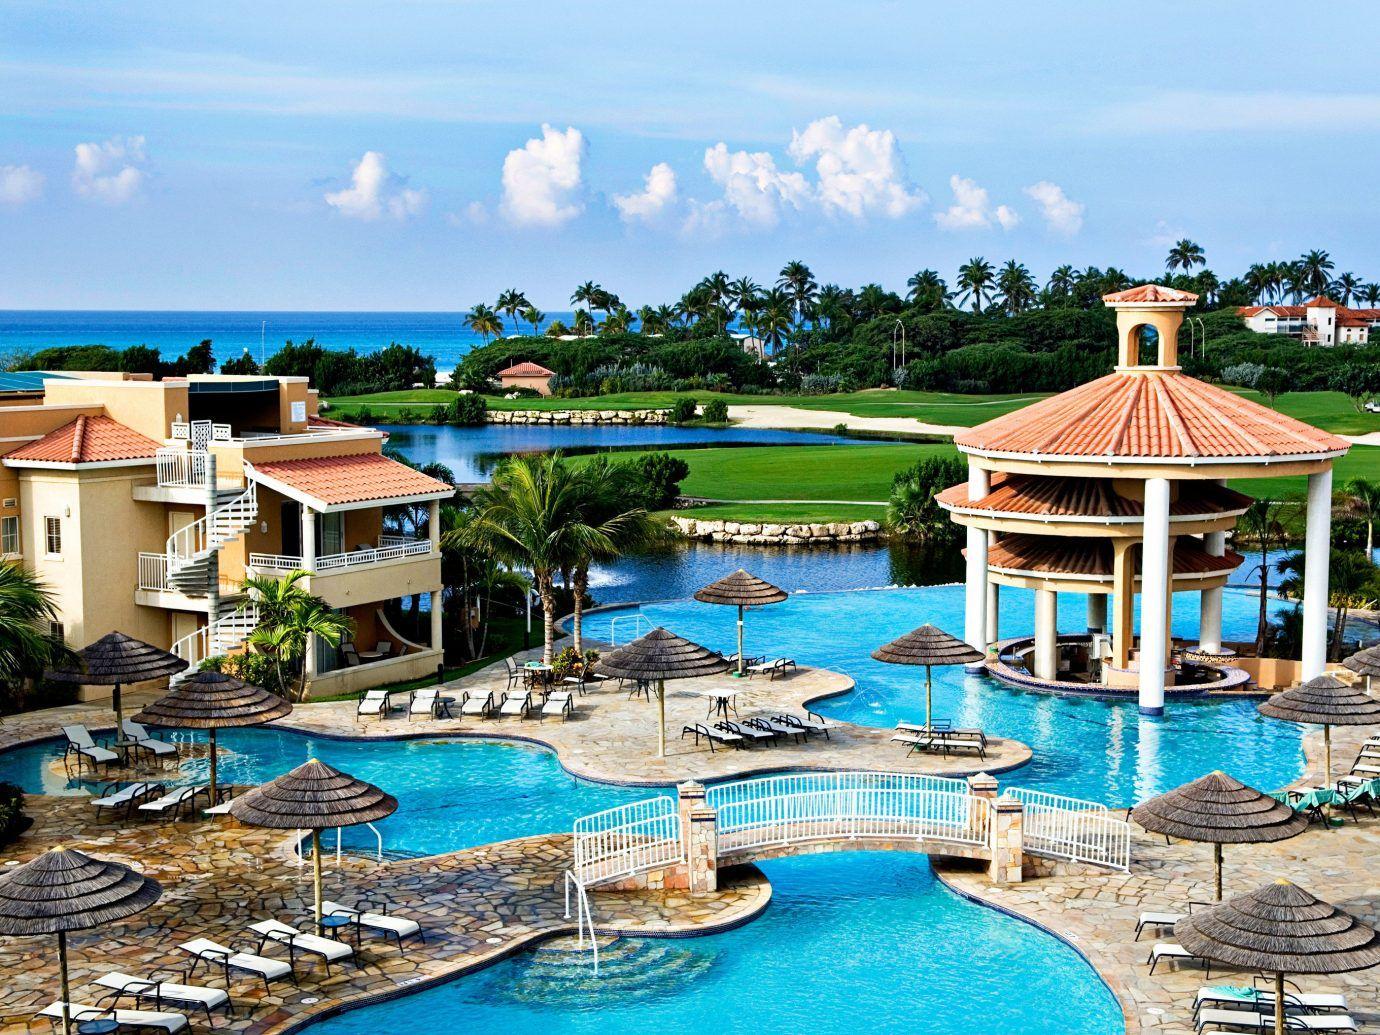 9 Best All Inclusive Resorts in Aruba Divi Barcelo Riu